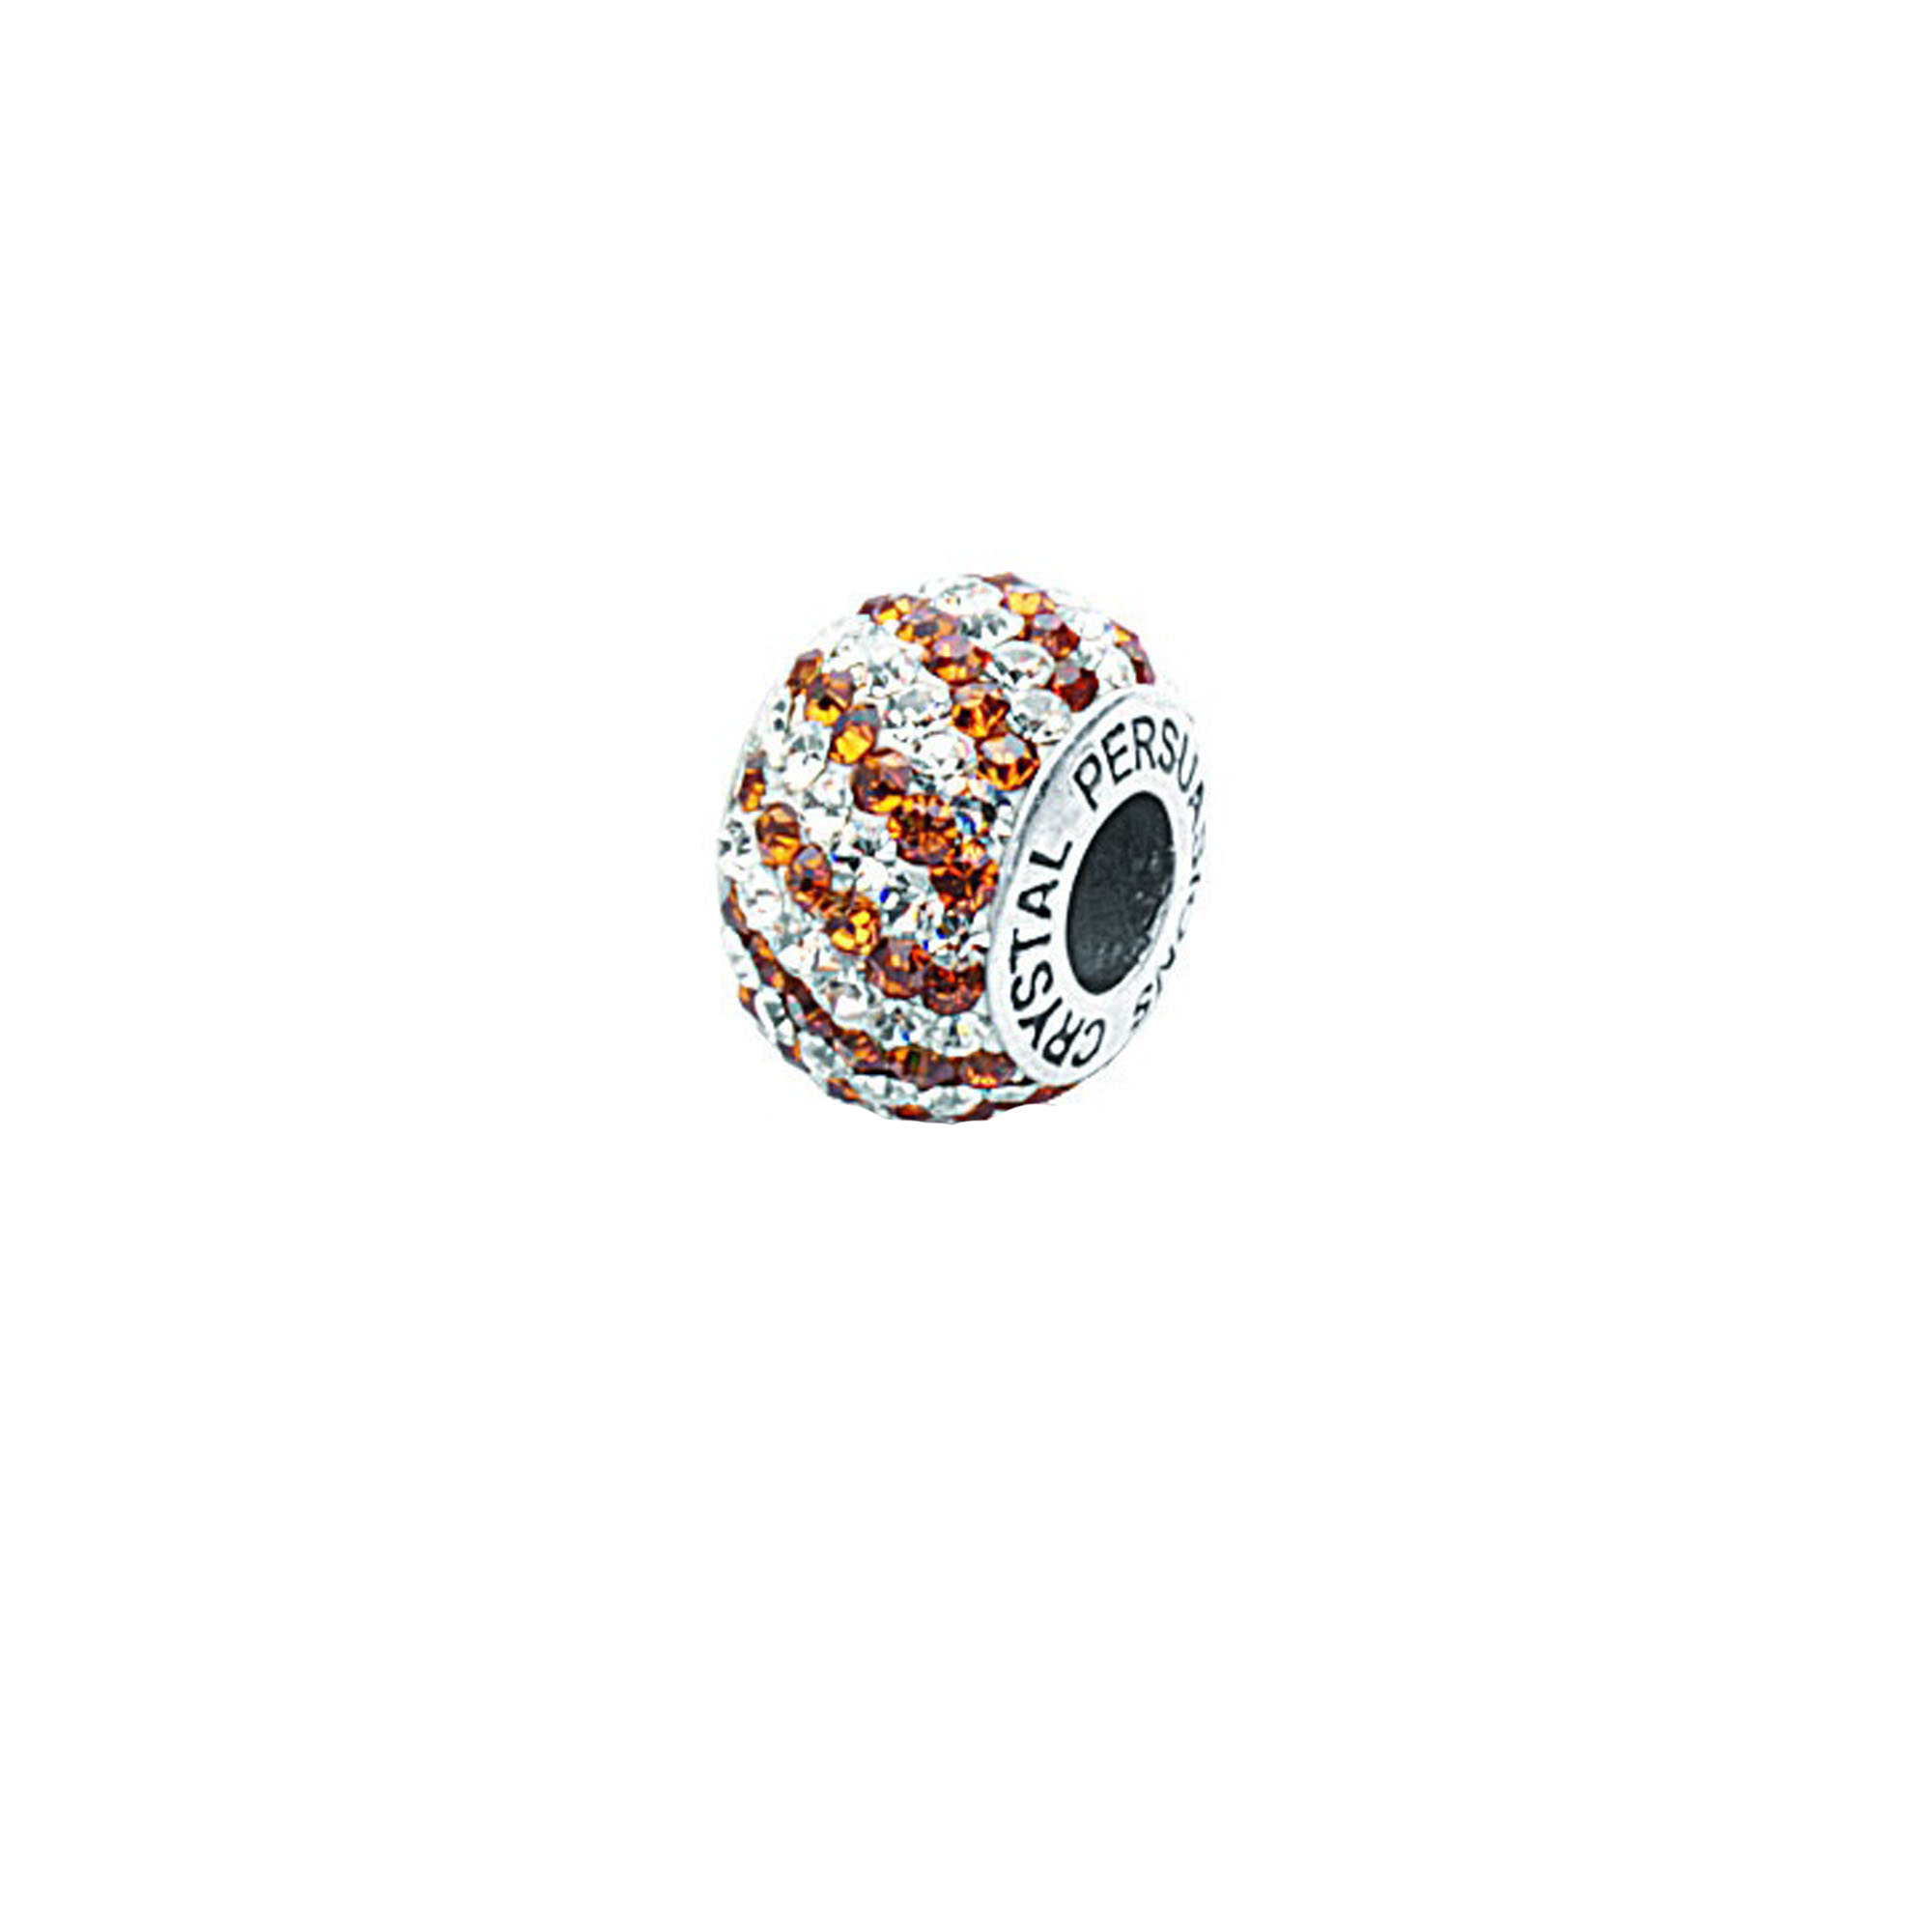 Silver Pendant, Amber/ White Swirl Crystal Bead